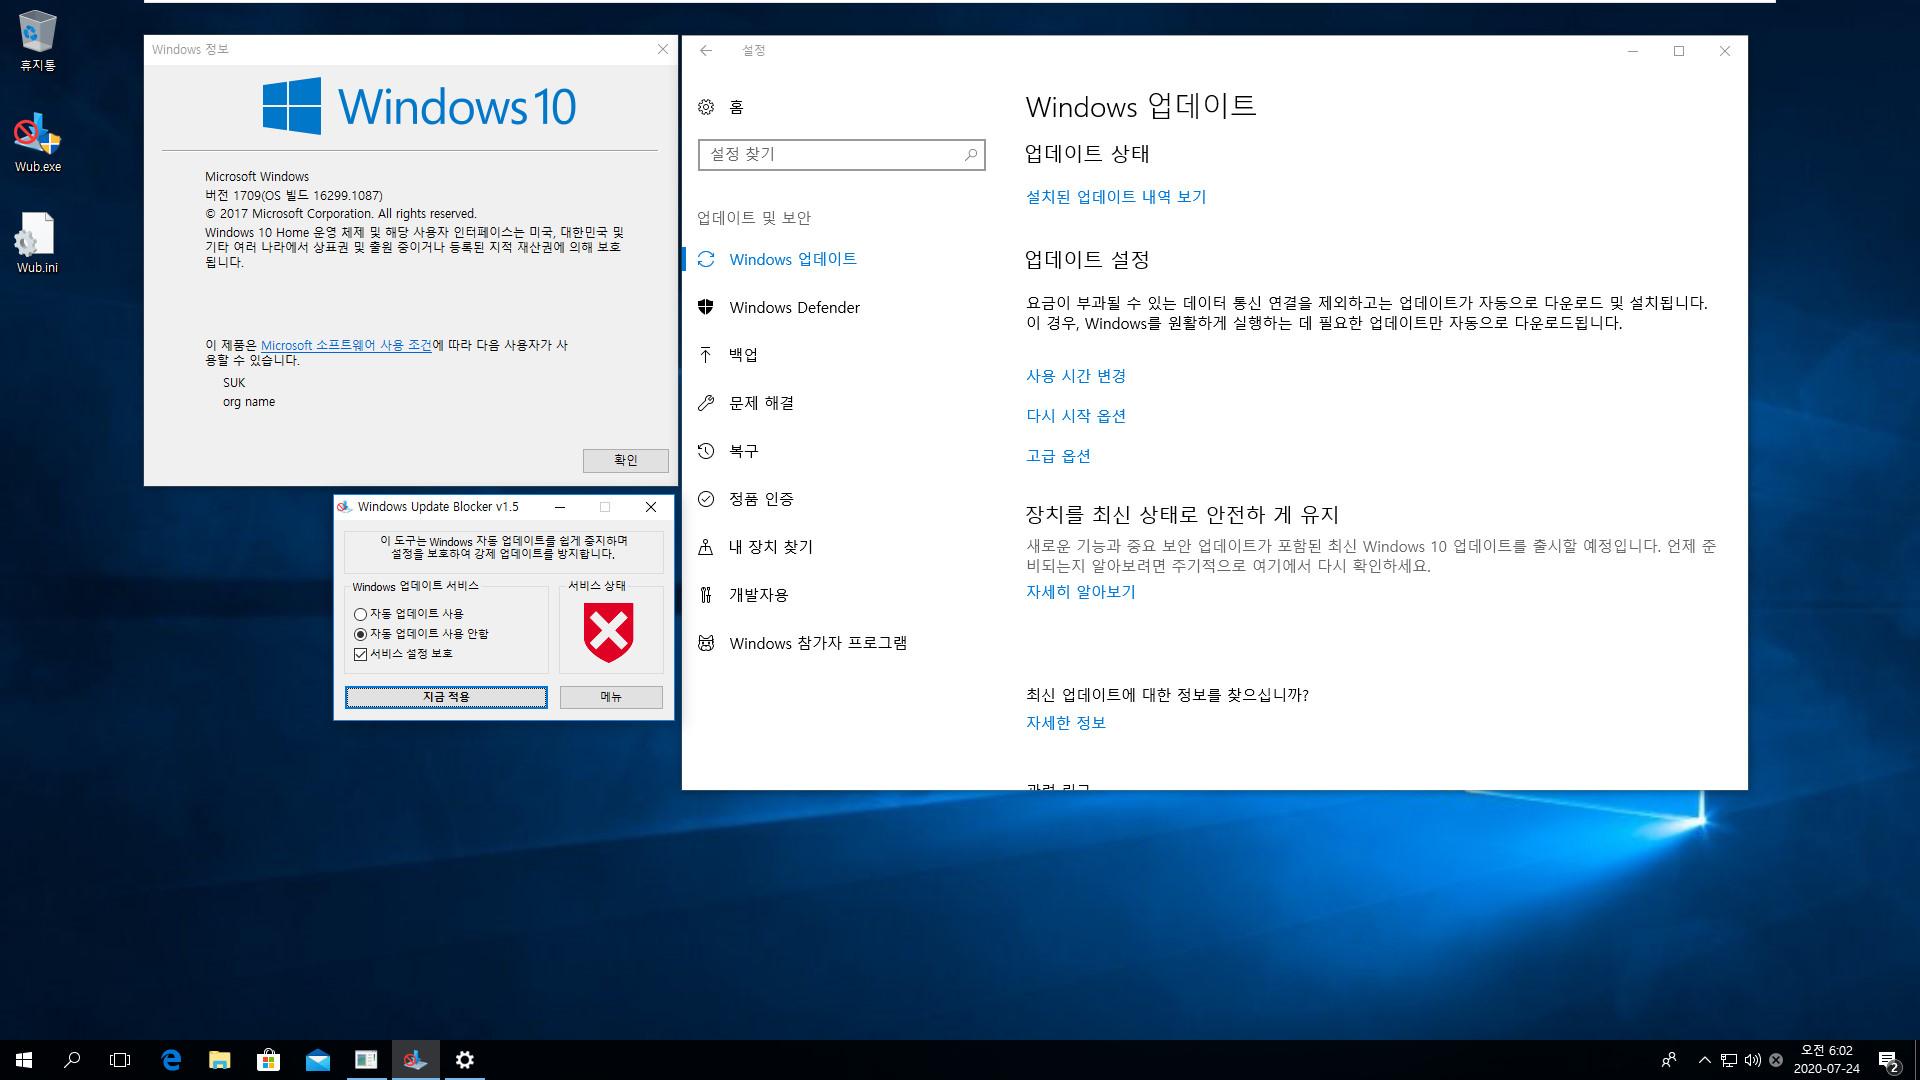 Windows Update Blocker v1.5 업데이트 방지 테스트 - 윈도우는 버전 1709으로 현재 강제 업데이트 중인 버전이고 홈 에디션 2020-07-24_060259.jpg